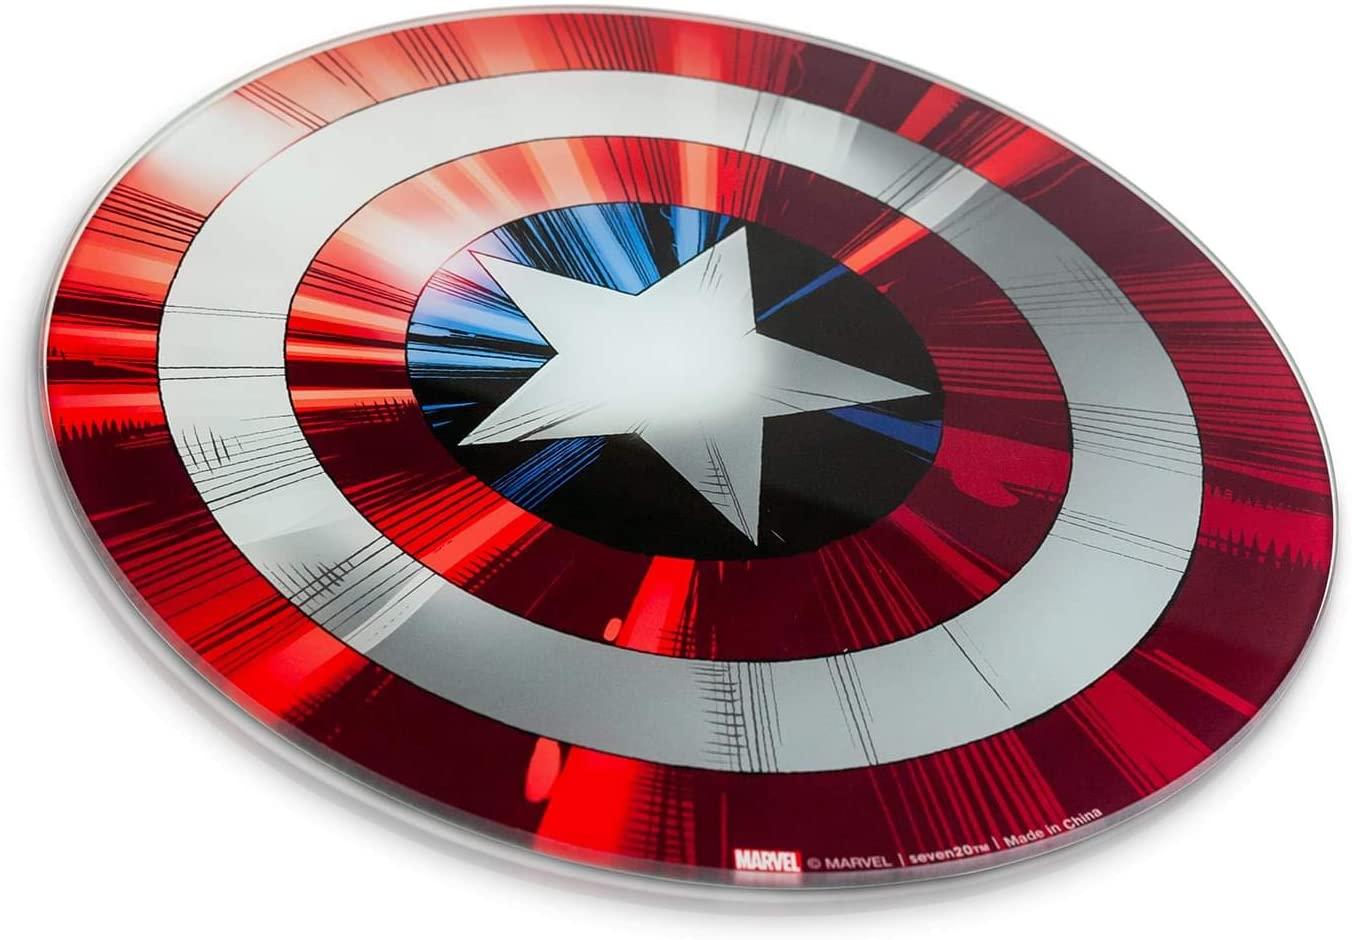 Captain America gift ideas cutting board marvel fans